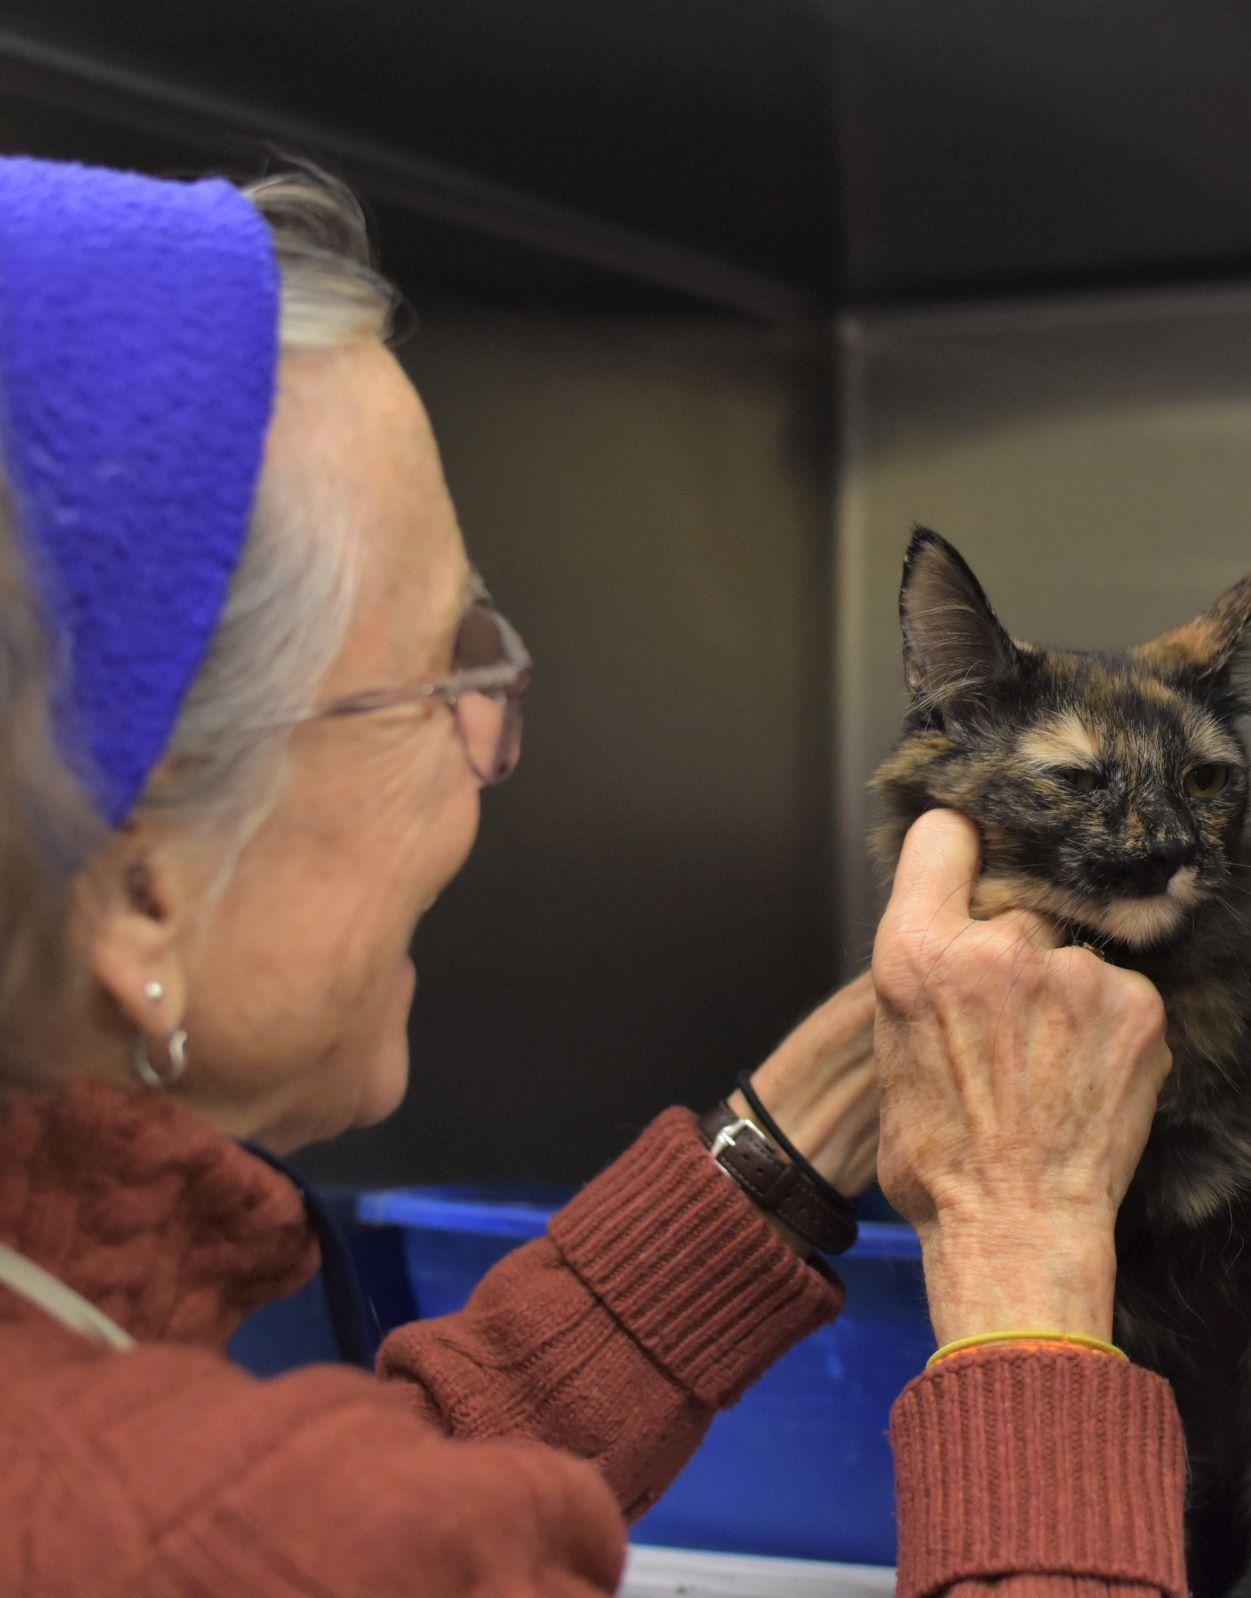 1.29.20_spendthedaywithus_FB and IG_cat volunteer